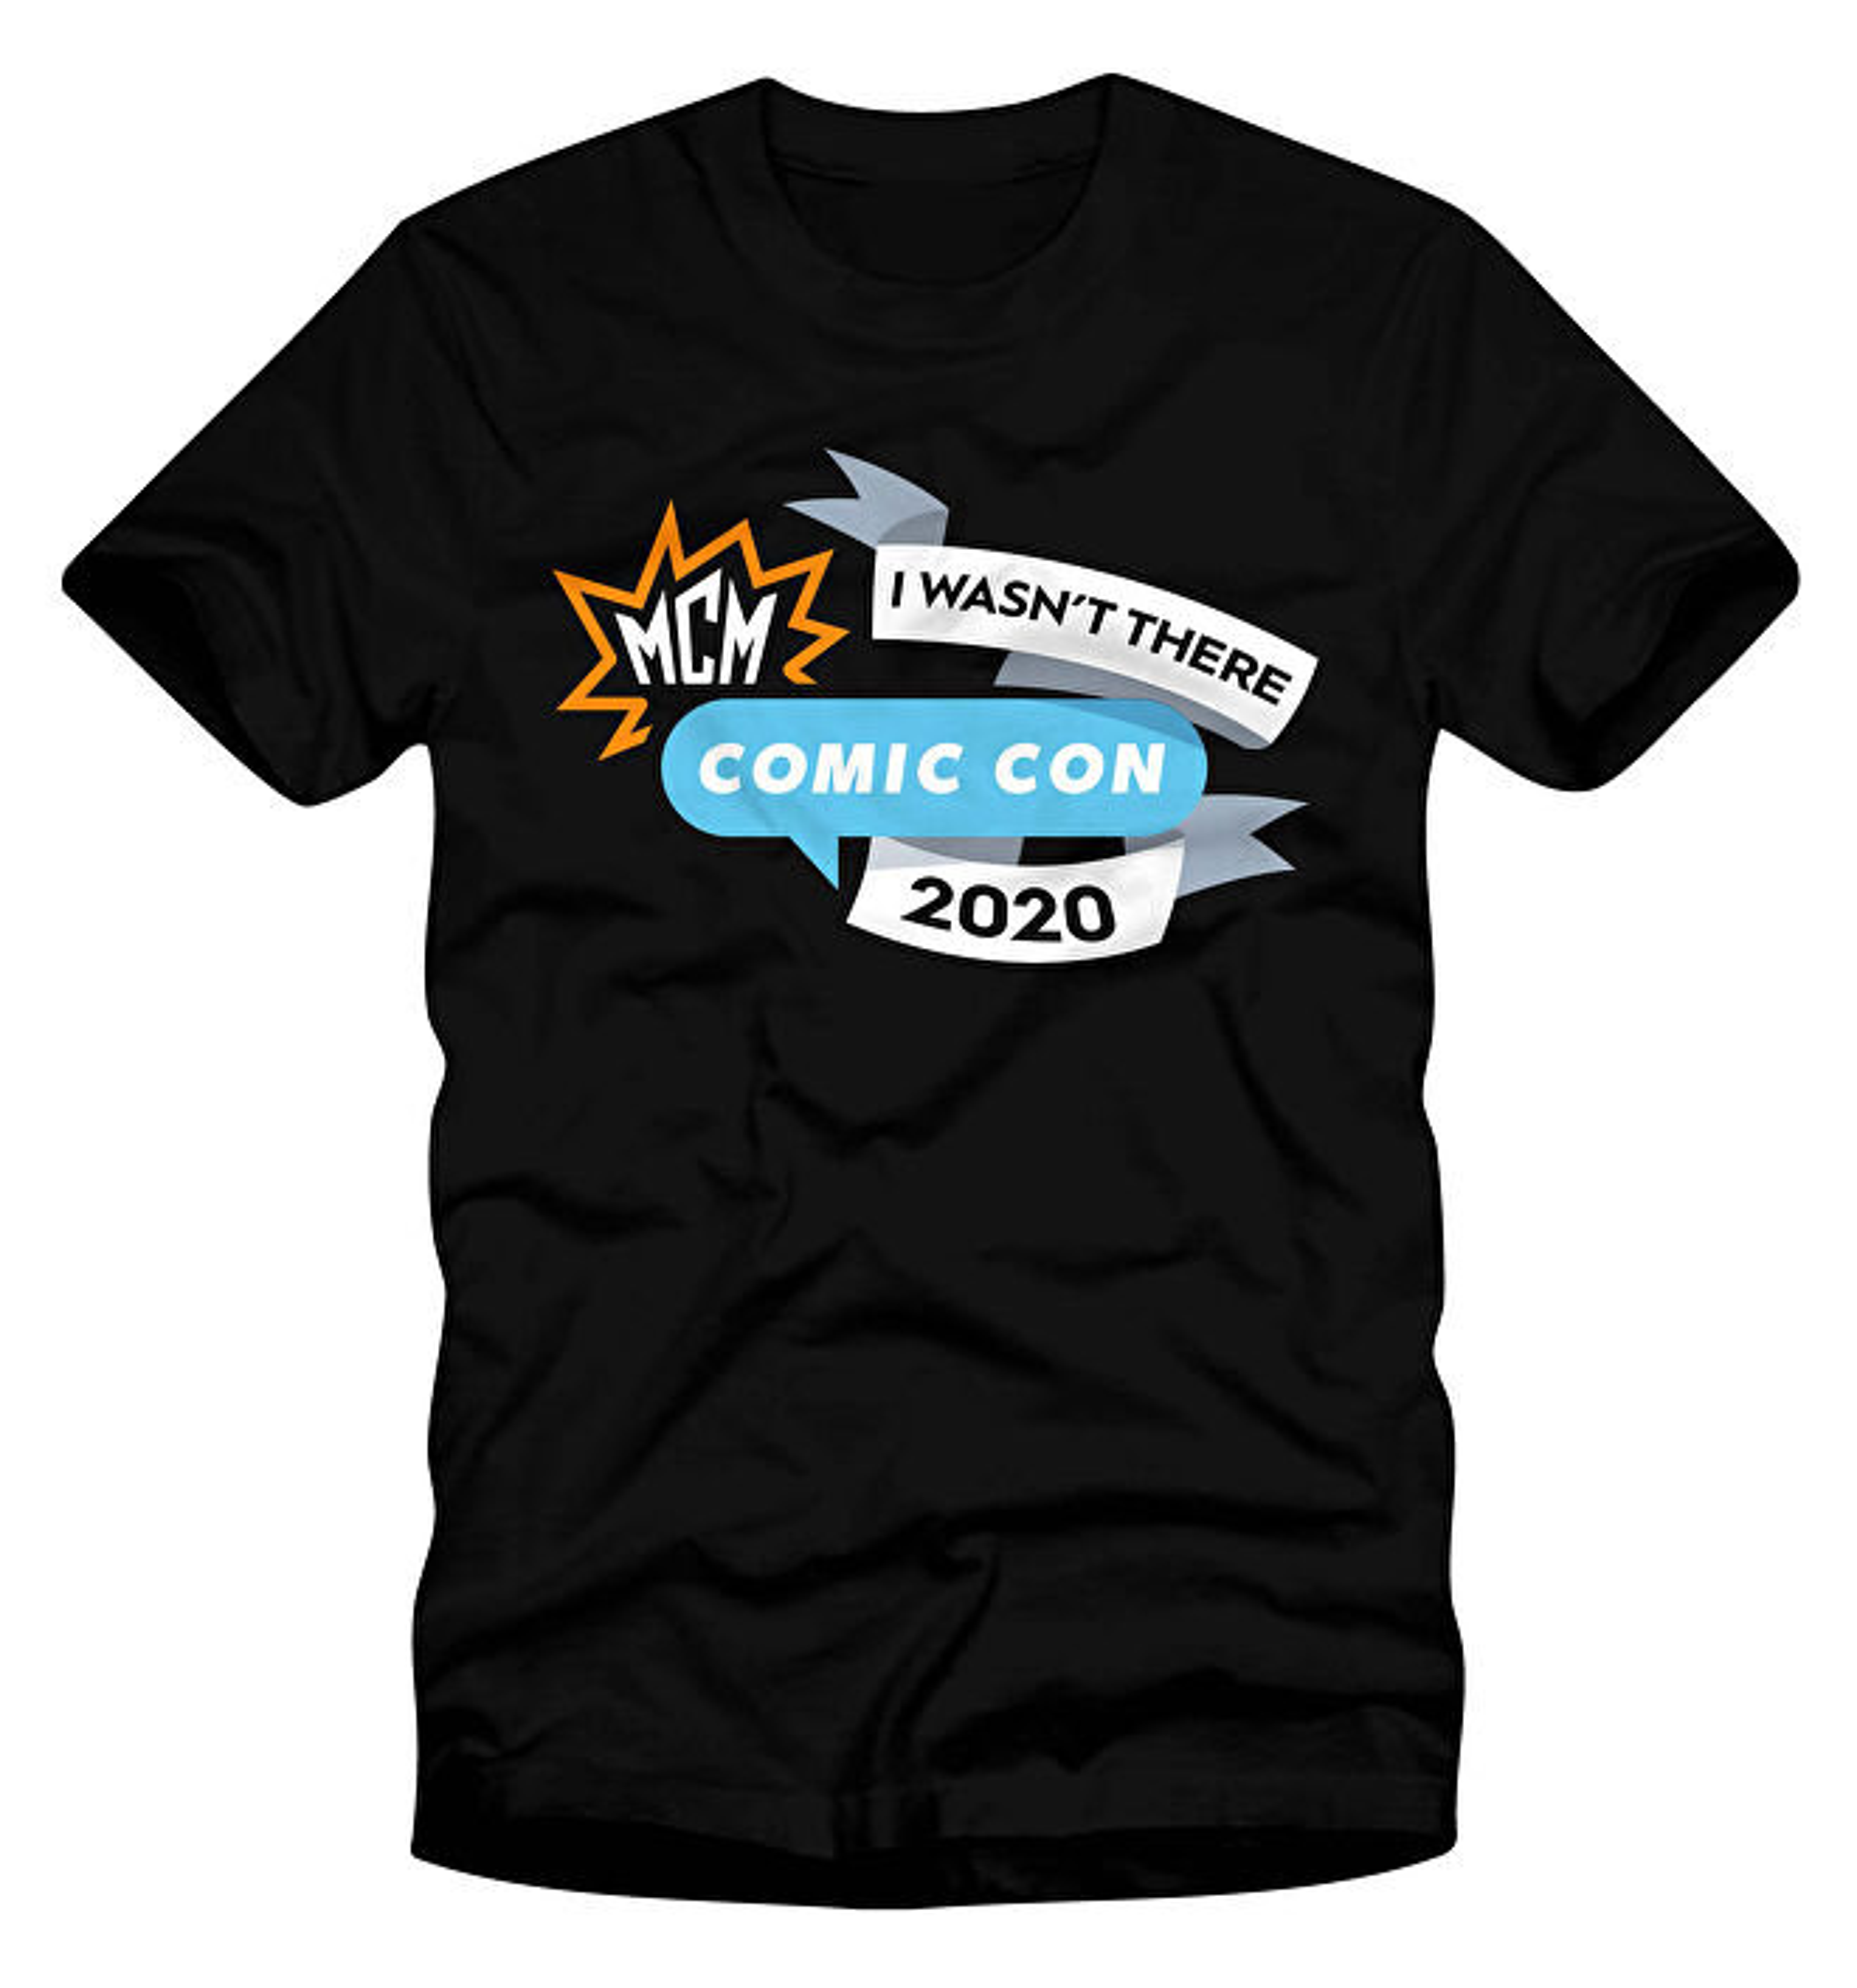 MCM_2020-I-Wasnt-There.jpg